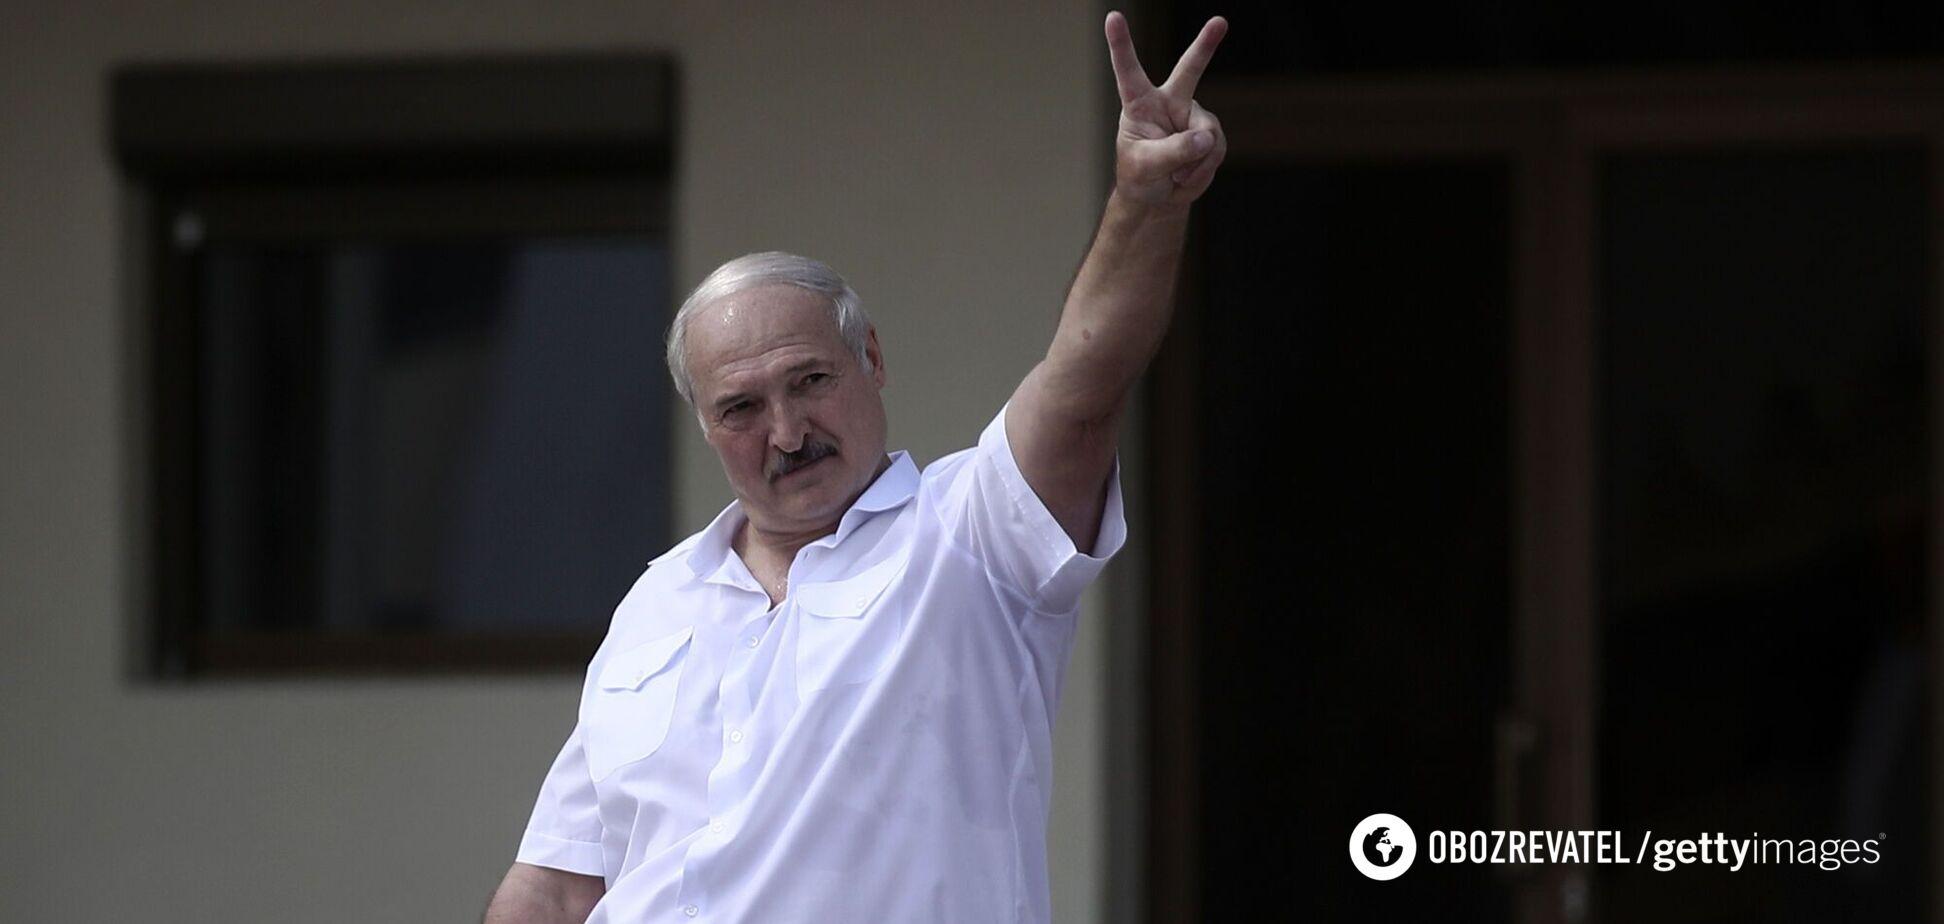 Александр Лукашенко занимает пост президента Беларуси с 1994 года